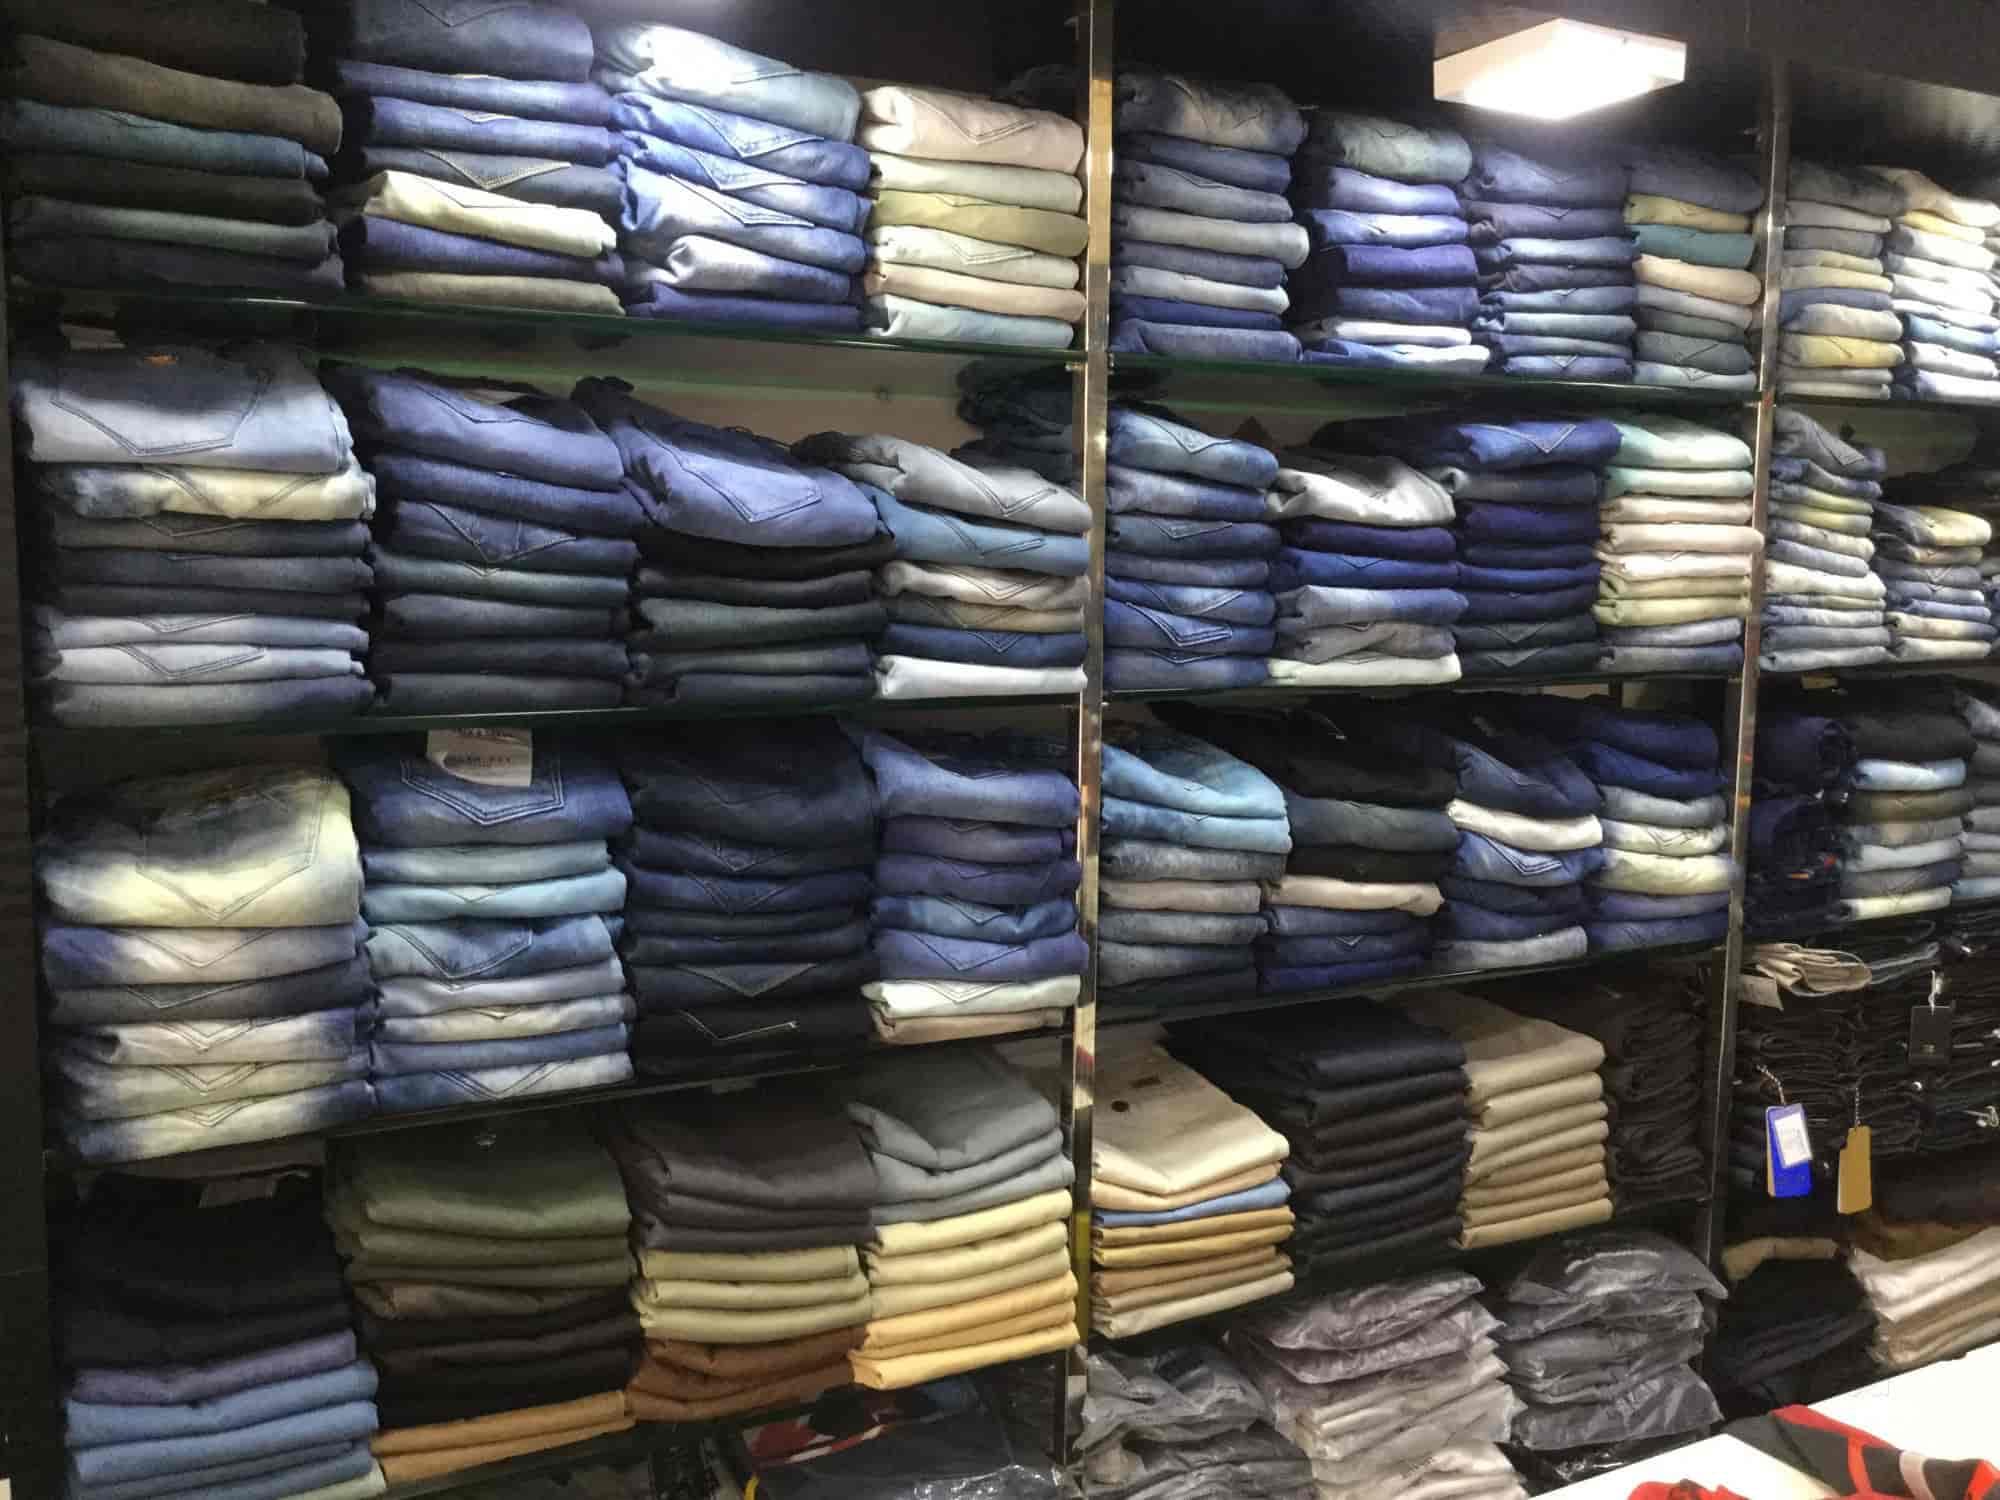 ... 36o Trendz Photos, Ganganagar, Bangalore - Gents Readymade Garment  Retailers ...